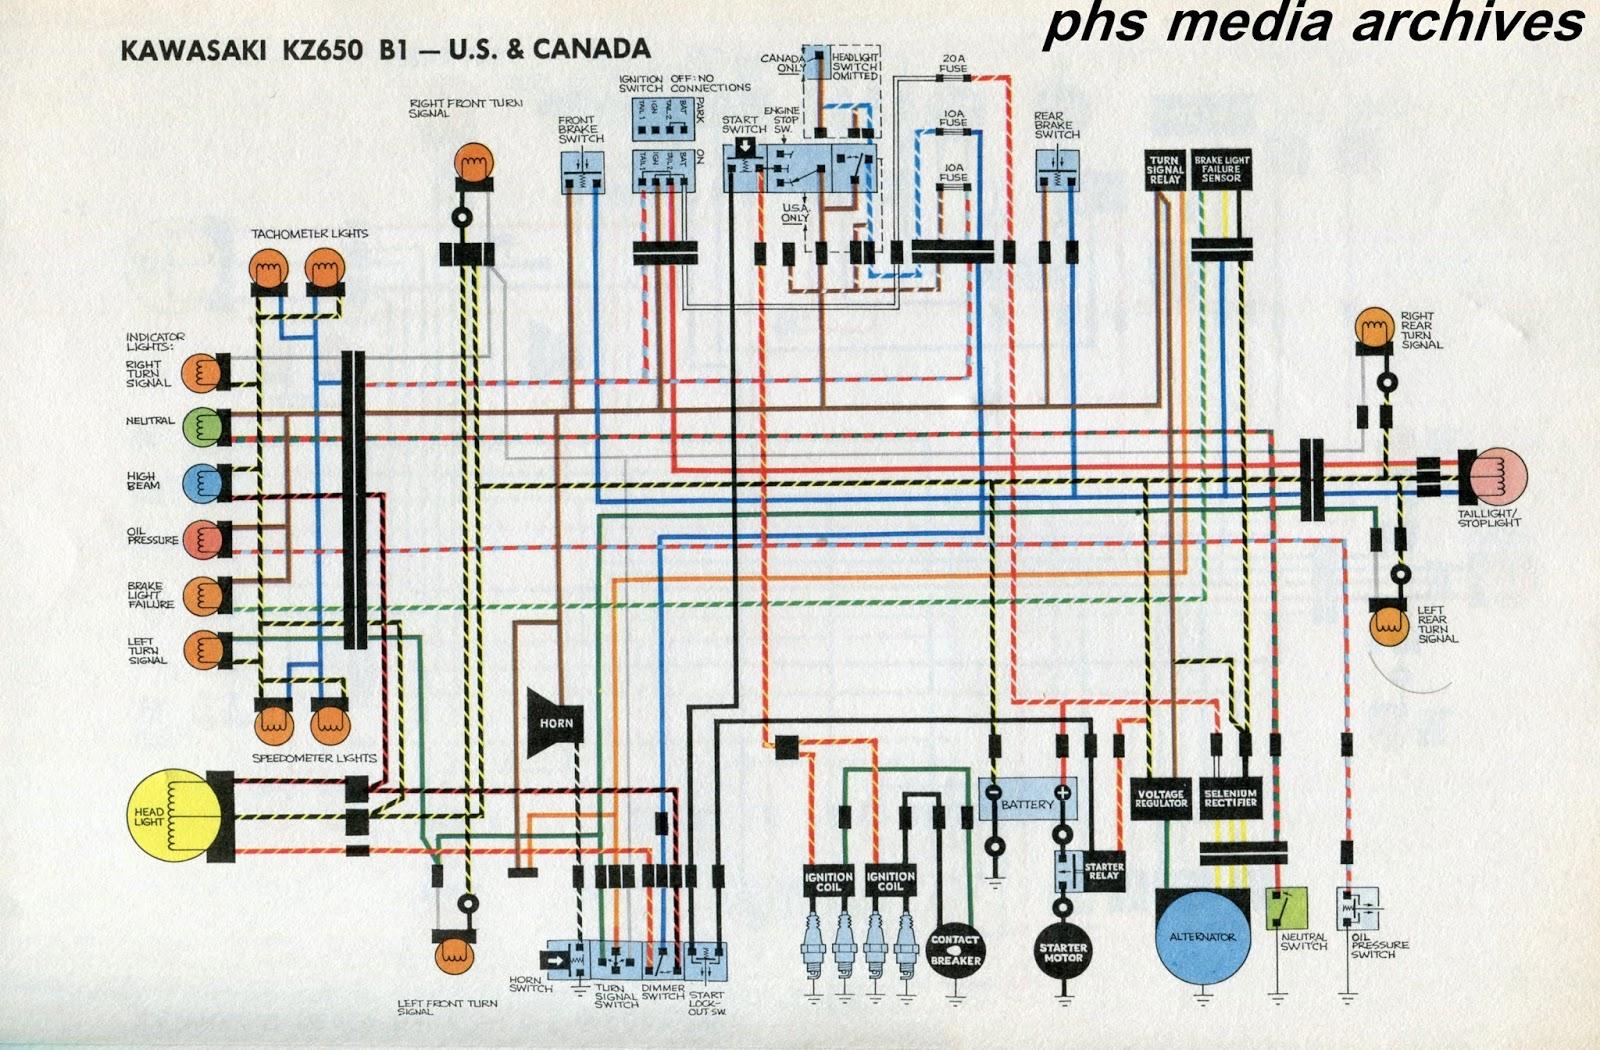 Z650 Wiring Diagram Skeletal System Without Labels Kawasaki Kz650 Circuit Symbols